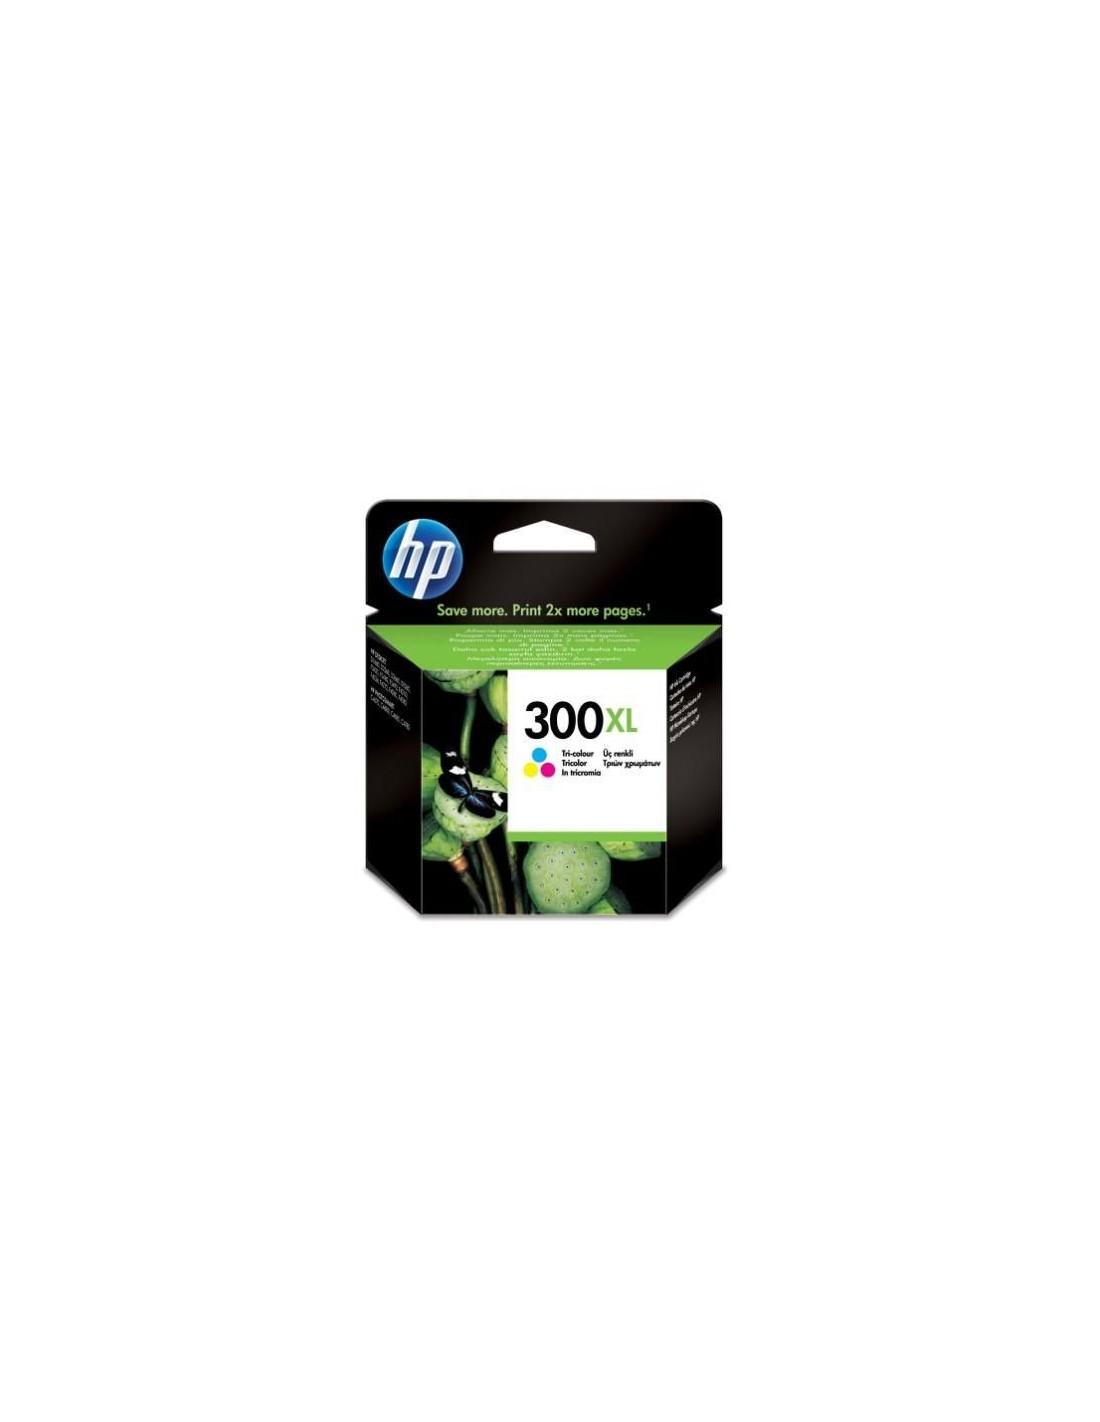 HP Deskjet D2560/F4280 cartucho tinta tricolor Nº300XL